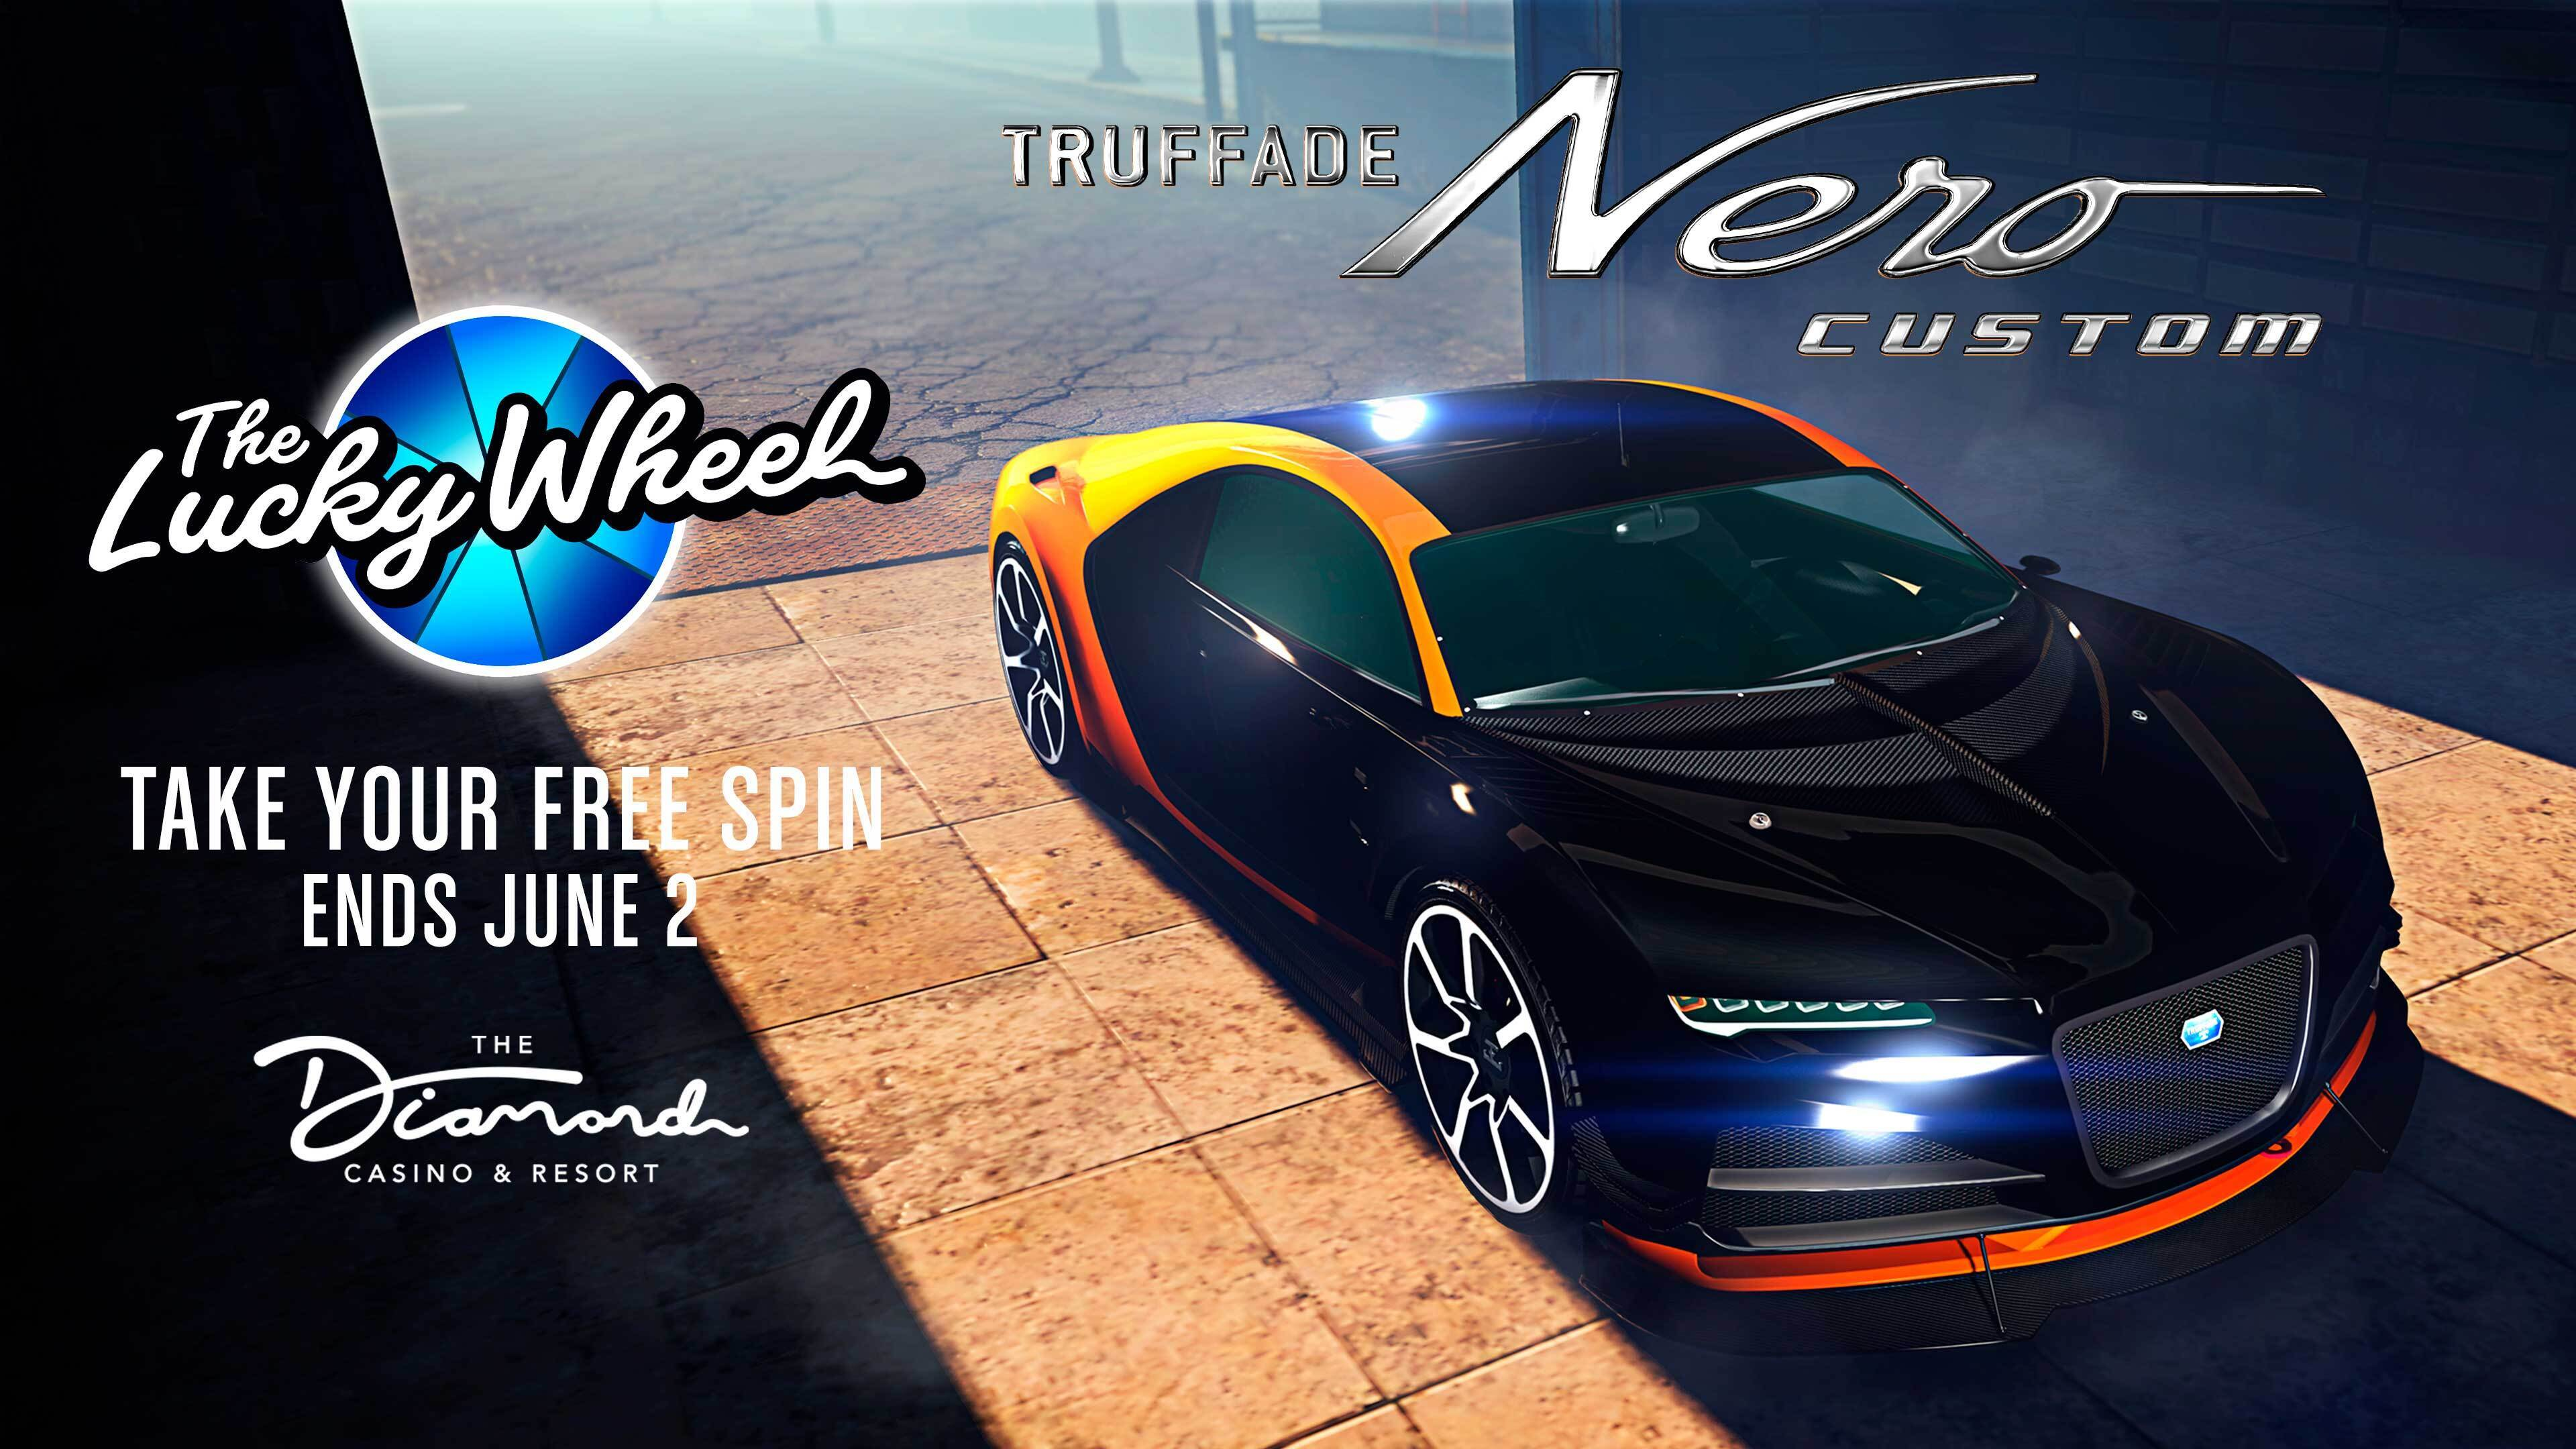 La Nero Custom est sur le podium du casino de GTAOnline